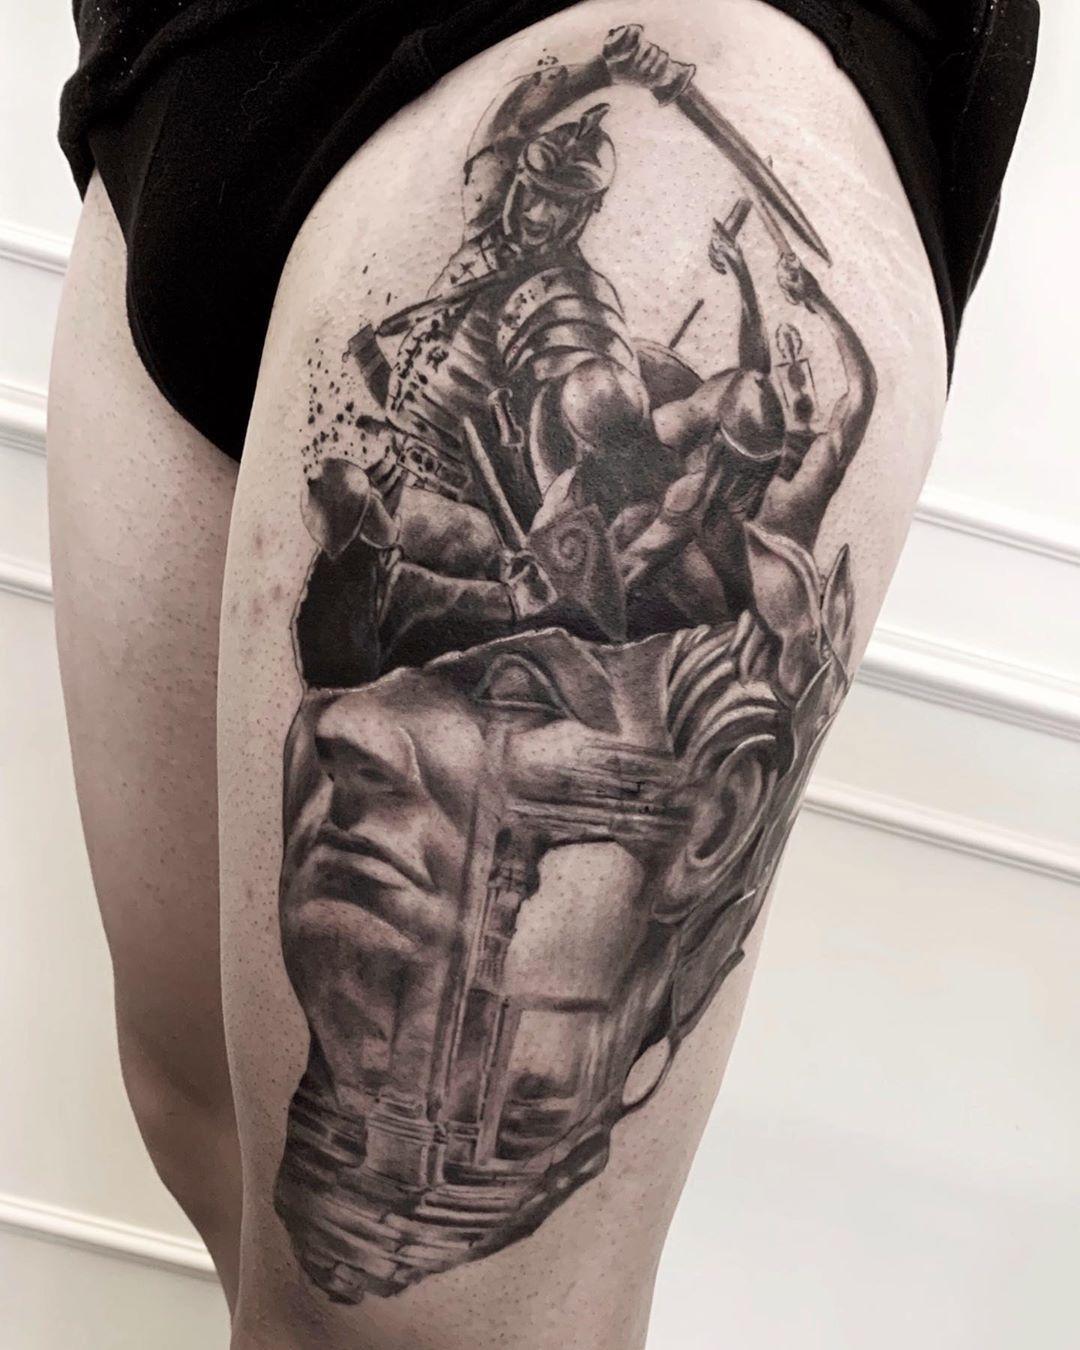 By @fabiofilipponetattoo  #tattoodefender #tattoodefenderteam #tattoodefenderaftercare #tattooink #tatuati #tatuatori #loveyourskin #movesafe #tattooart #tattoos #tat #tattooing #realistic #realistictattoo #tattoorealistic #realistictattoos #realisticink #ink #inktattoo